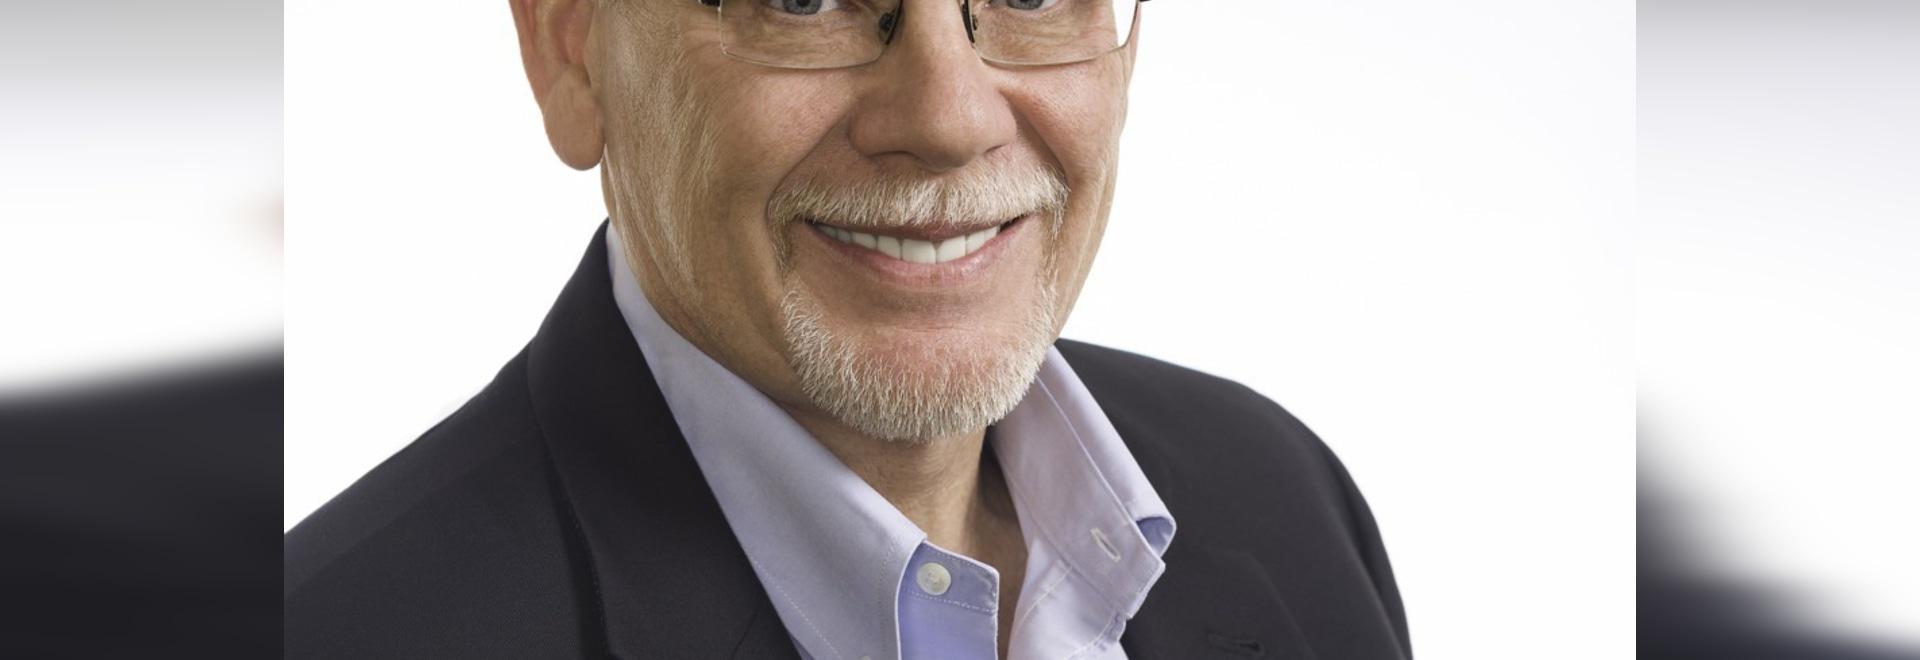 Web Industries Inc. Chief Executive Officer Mark Pihl